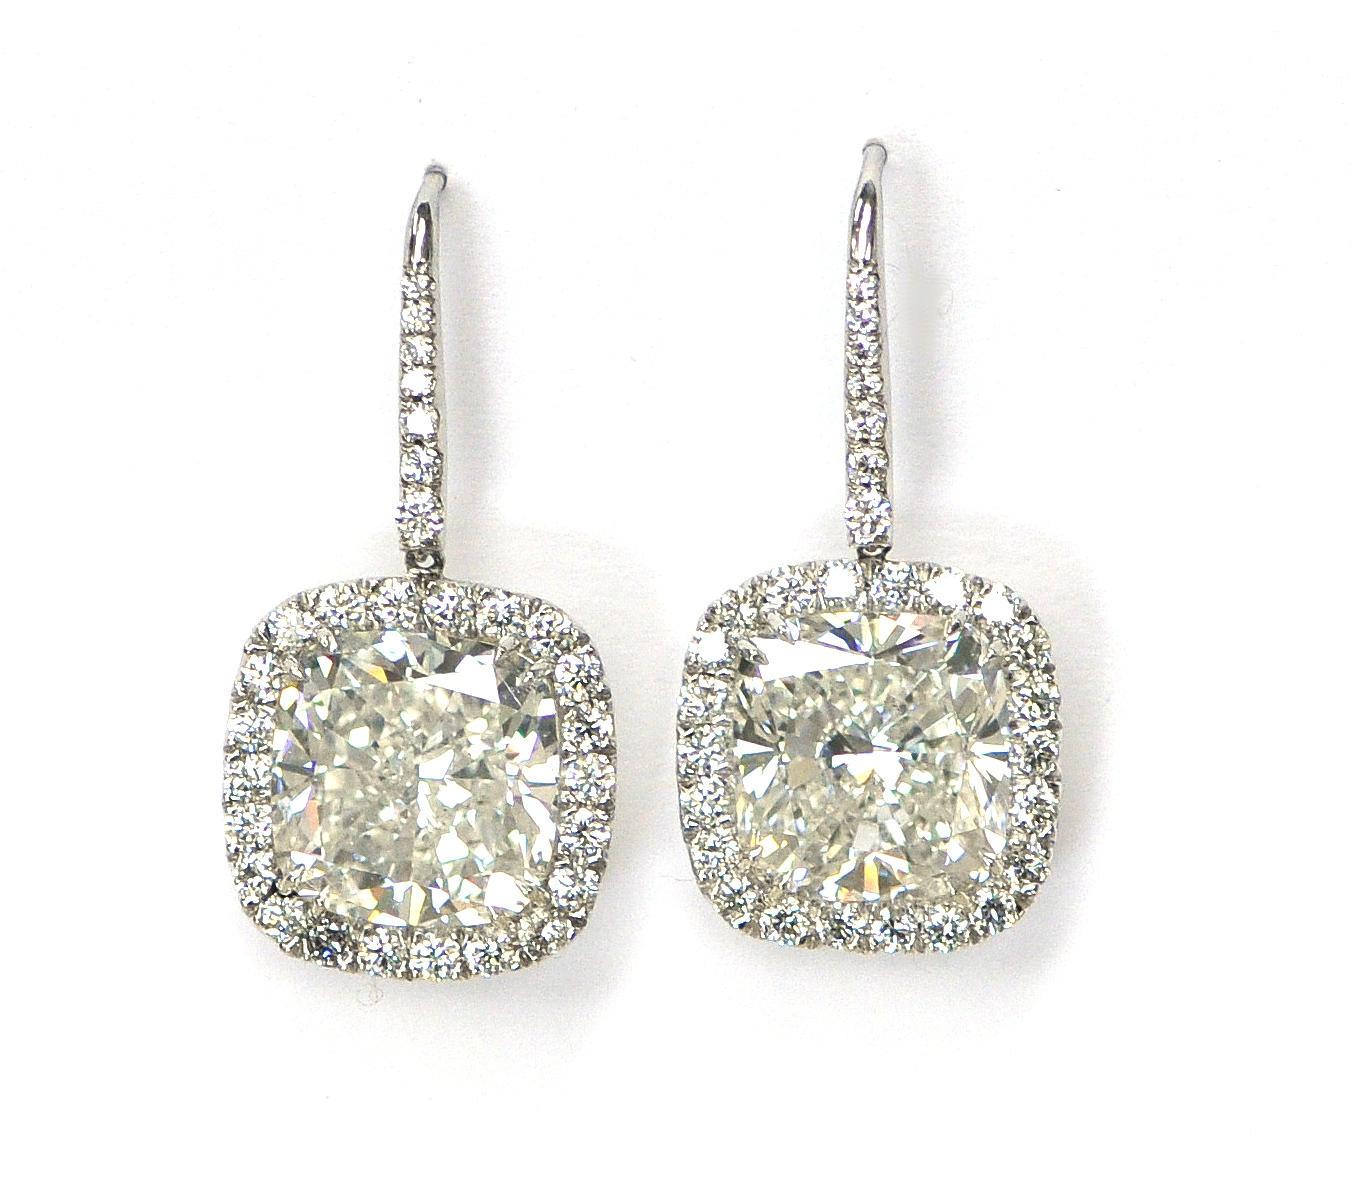 20ct Diamond Earrings